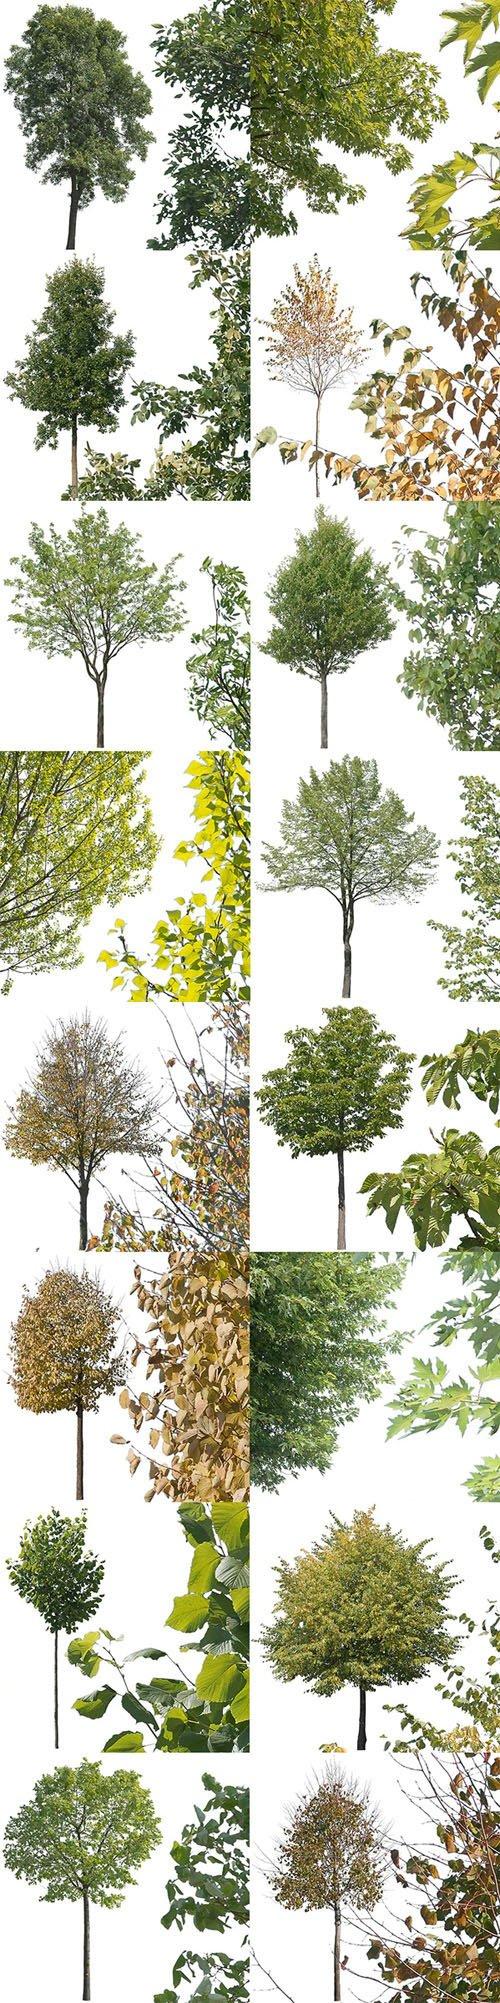 16 Cutout Trees - Transparent Stock Images